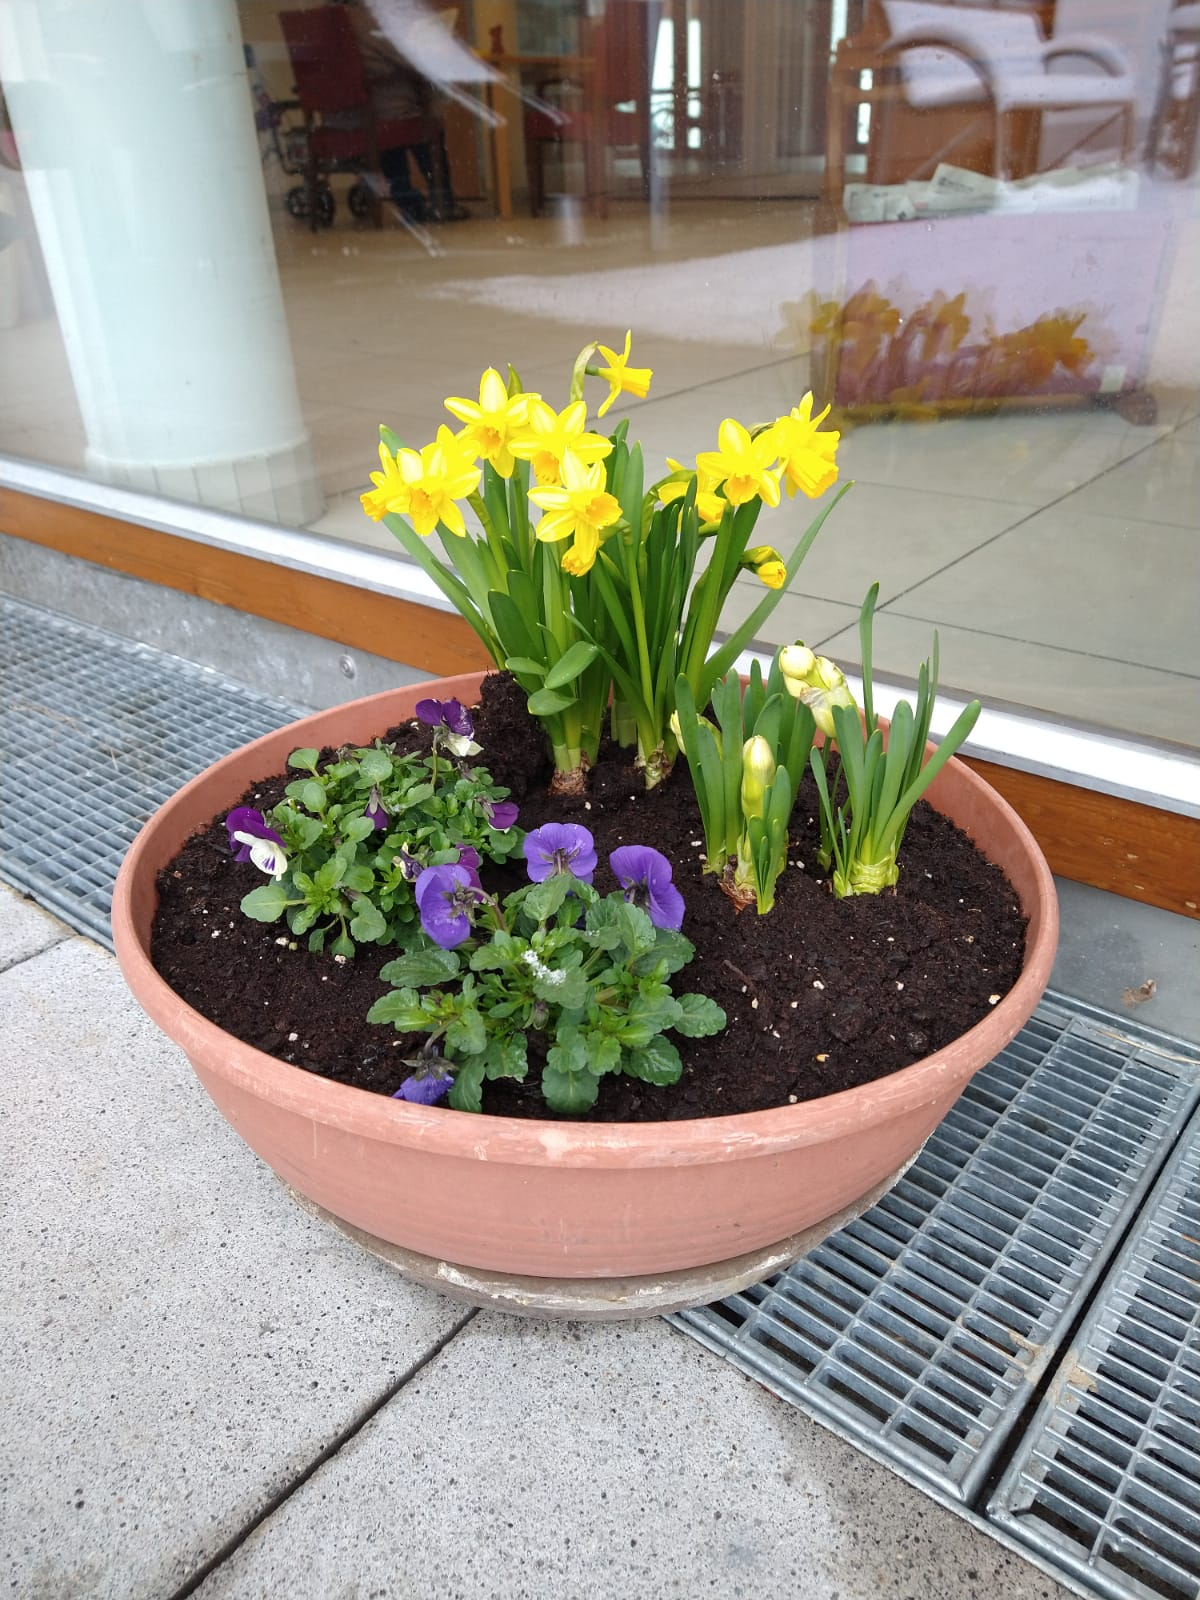 Frühlingsgruß Im Chiemgau-Stift